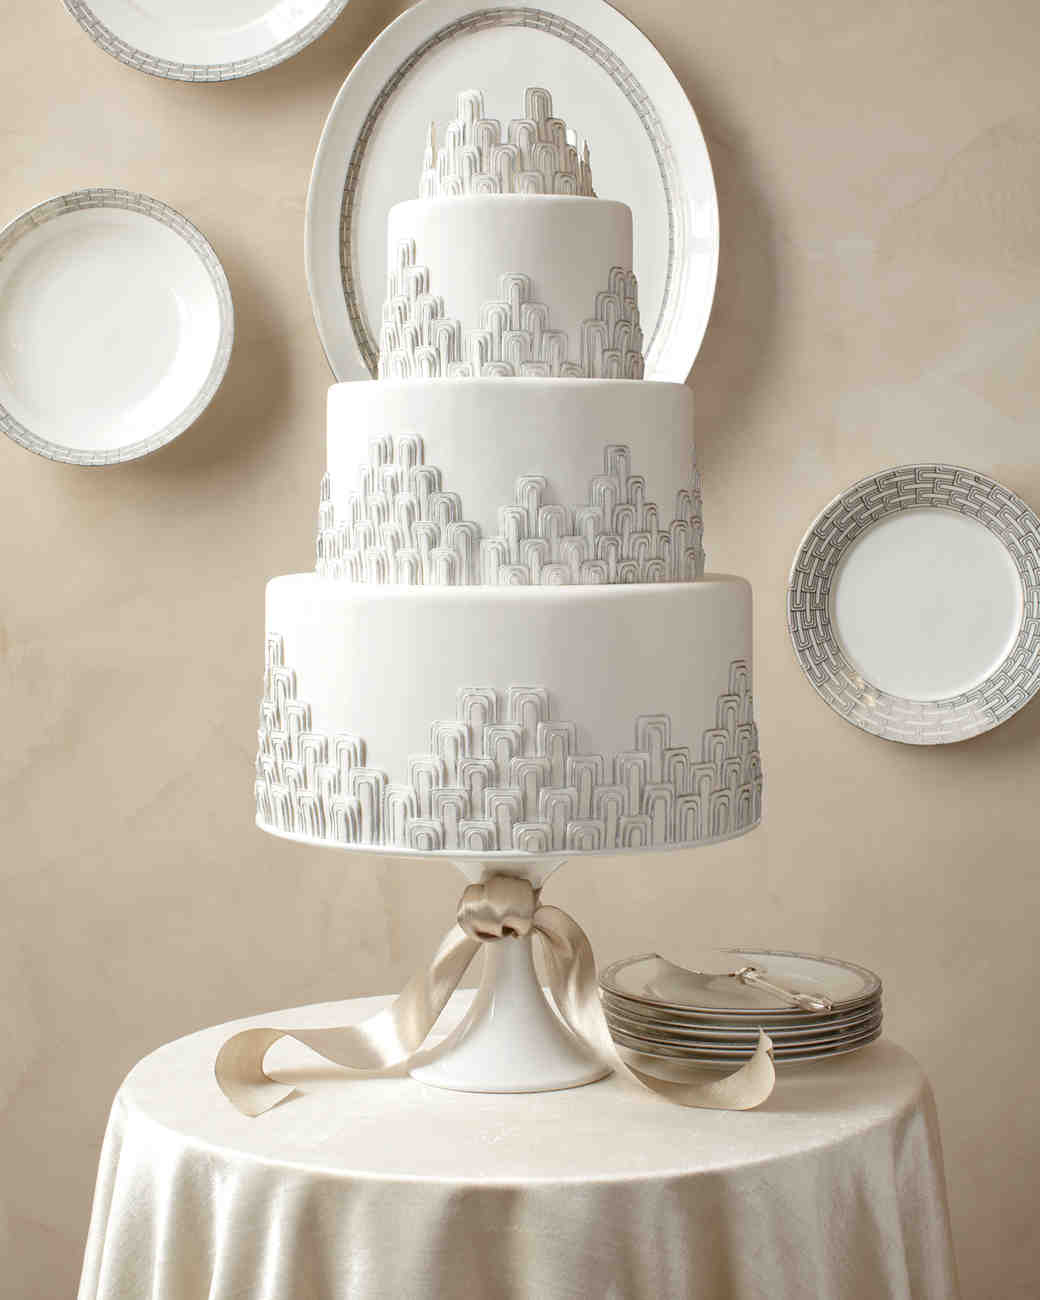 Wedding Cakes Inspired by China Patterns | Martha Stewart Weddings